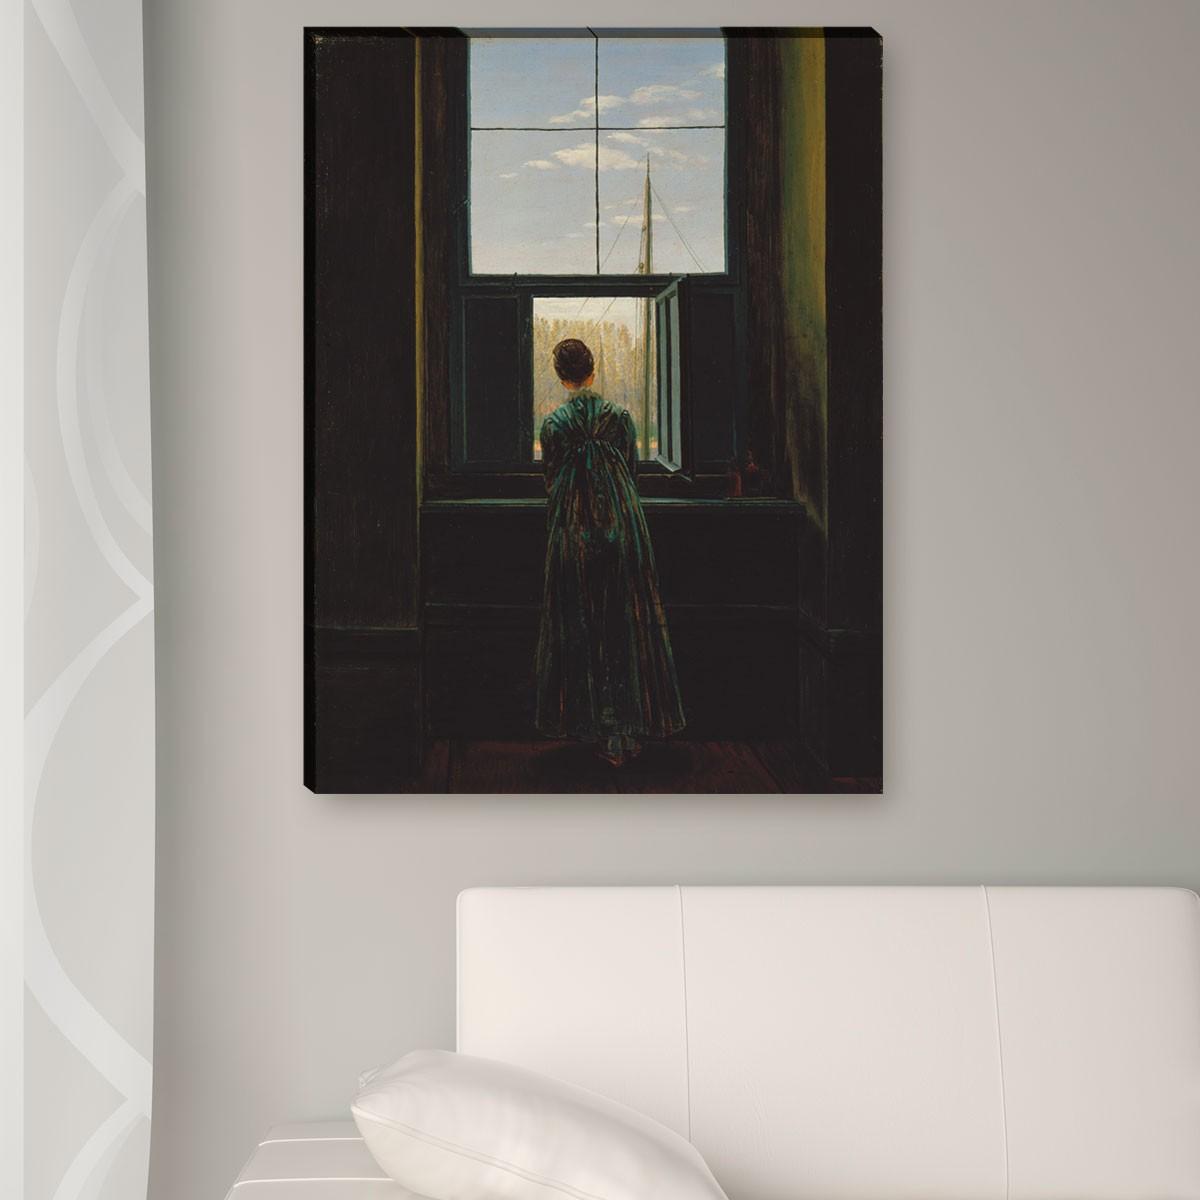 caspar david friedrich frau am fenster. Black Bedroom Furniture Sets. Home Design Ideas